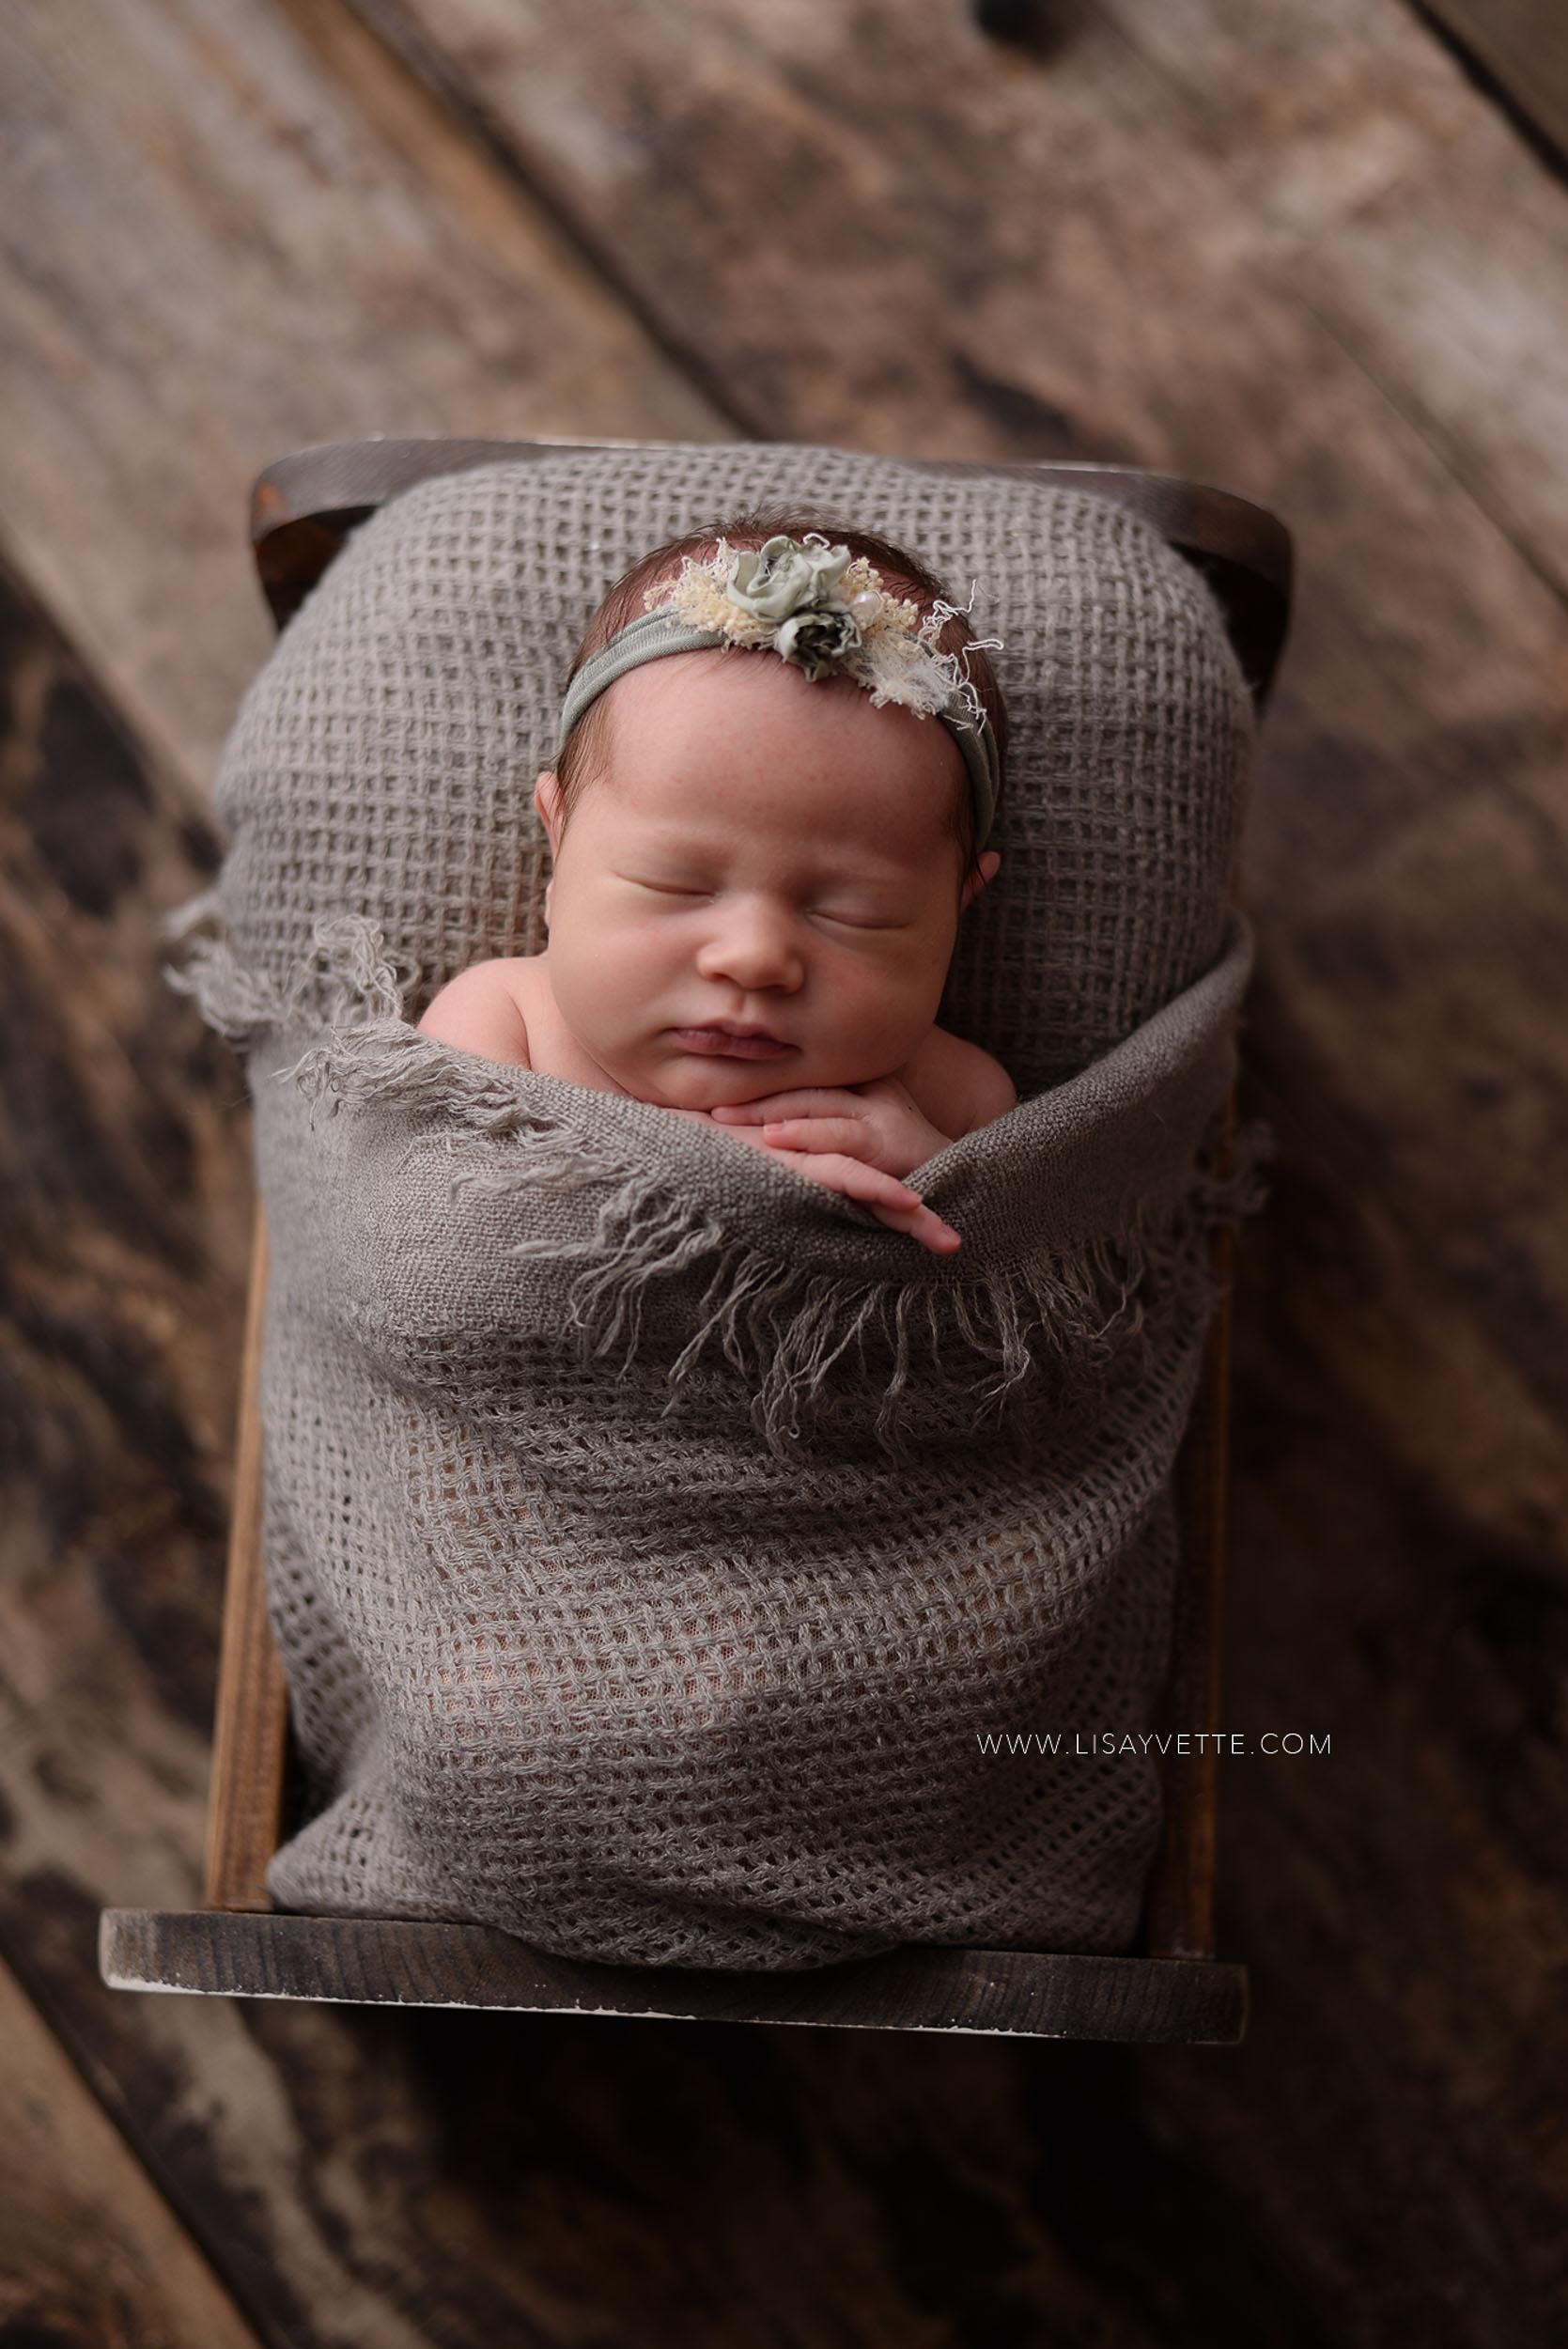 charlotte-nc-newborn-photographer-lisa-yvette-1051.jpg